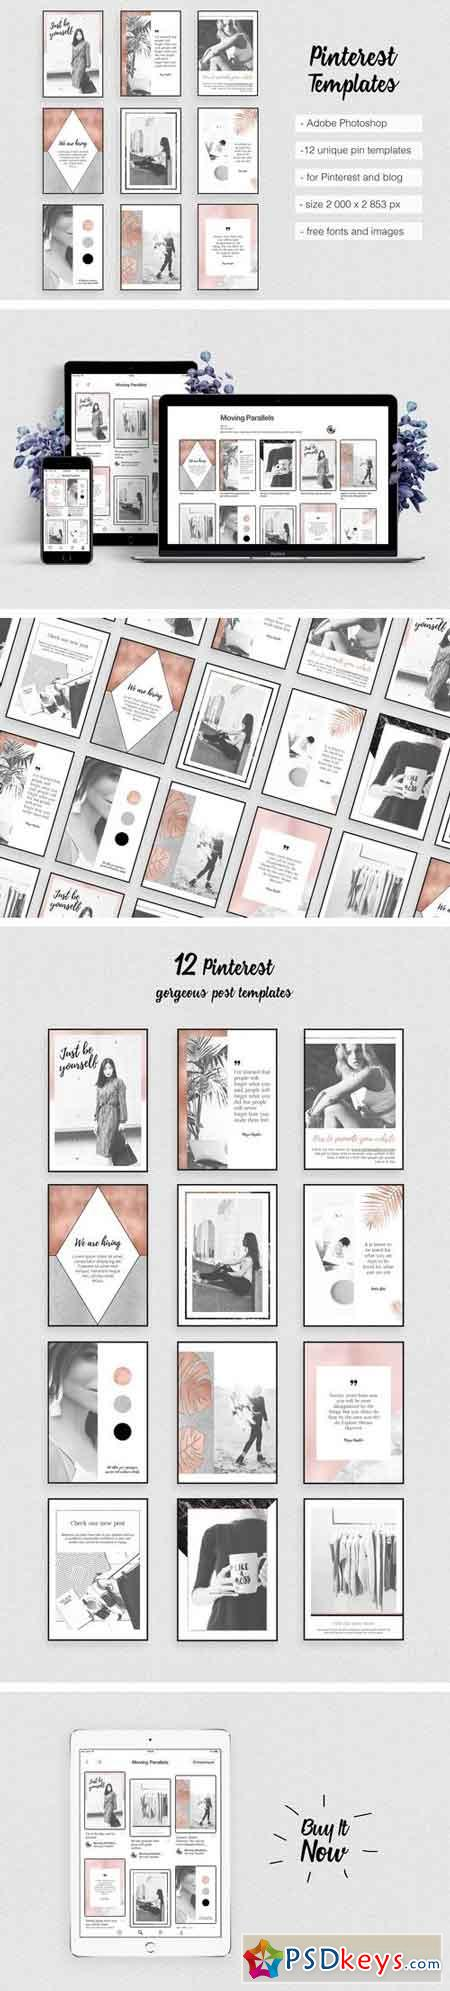 Pinterest Templates Rose Gold 2000348